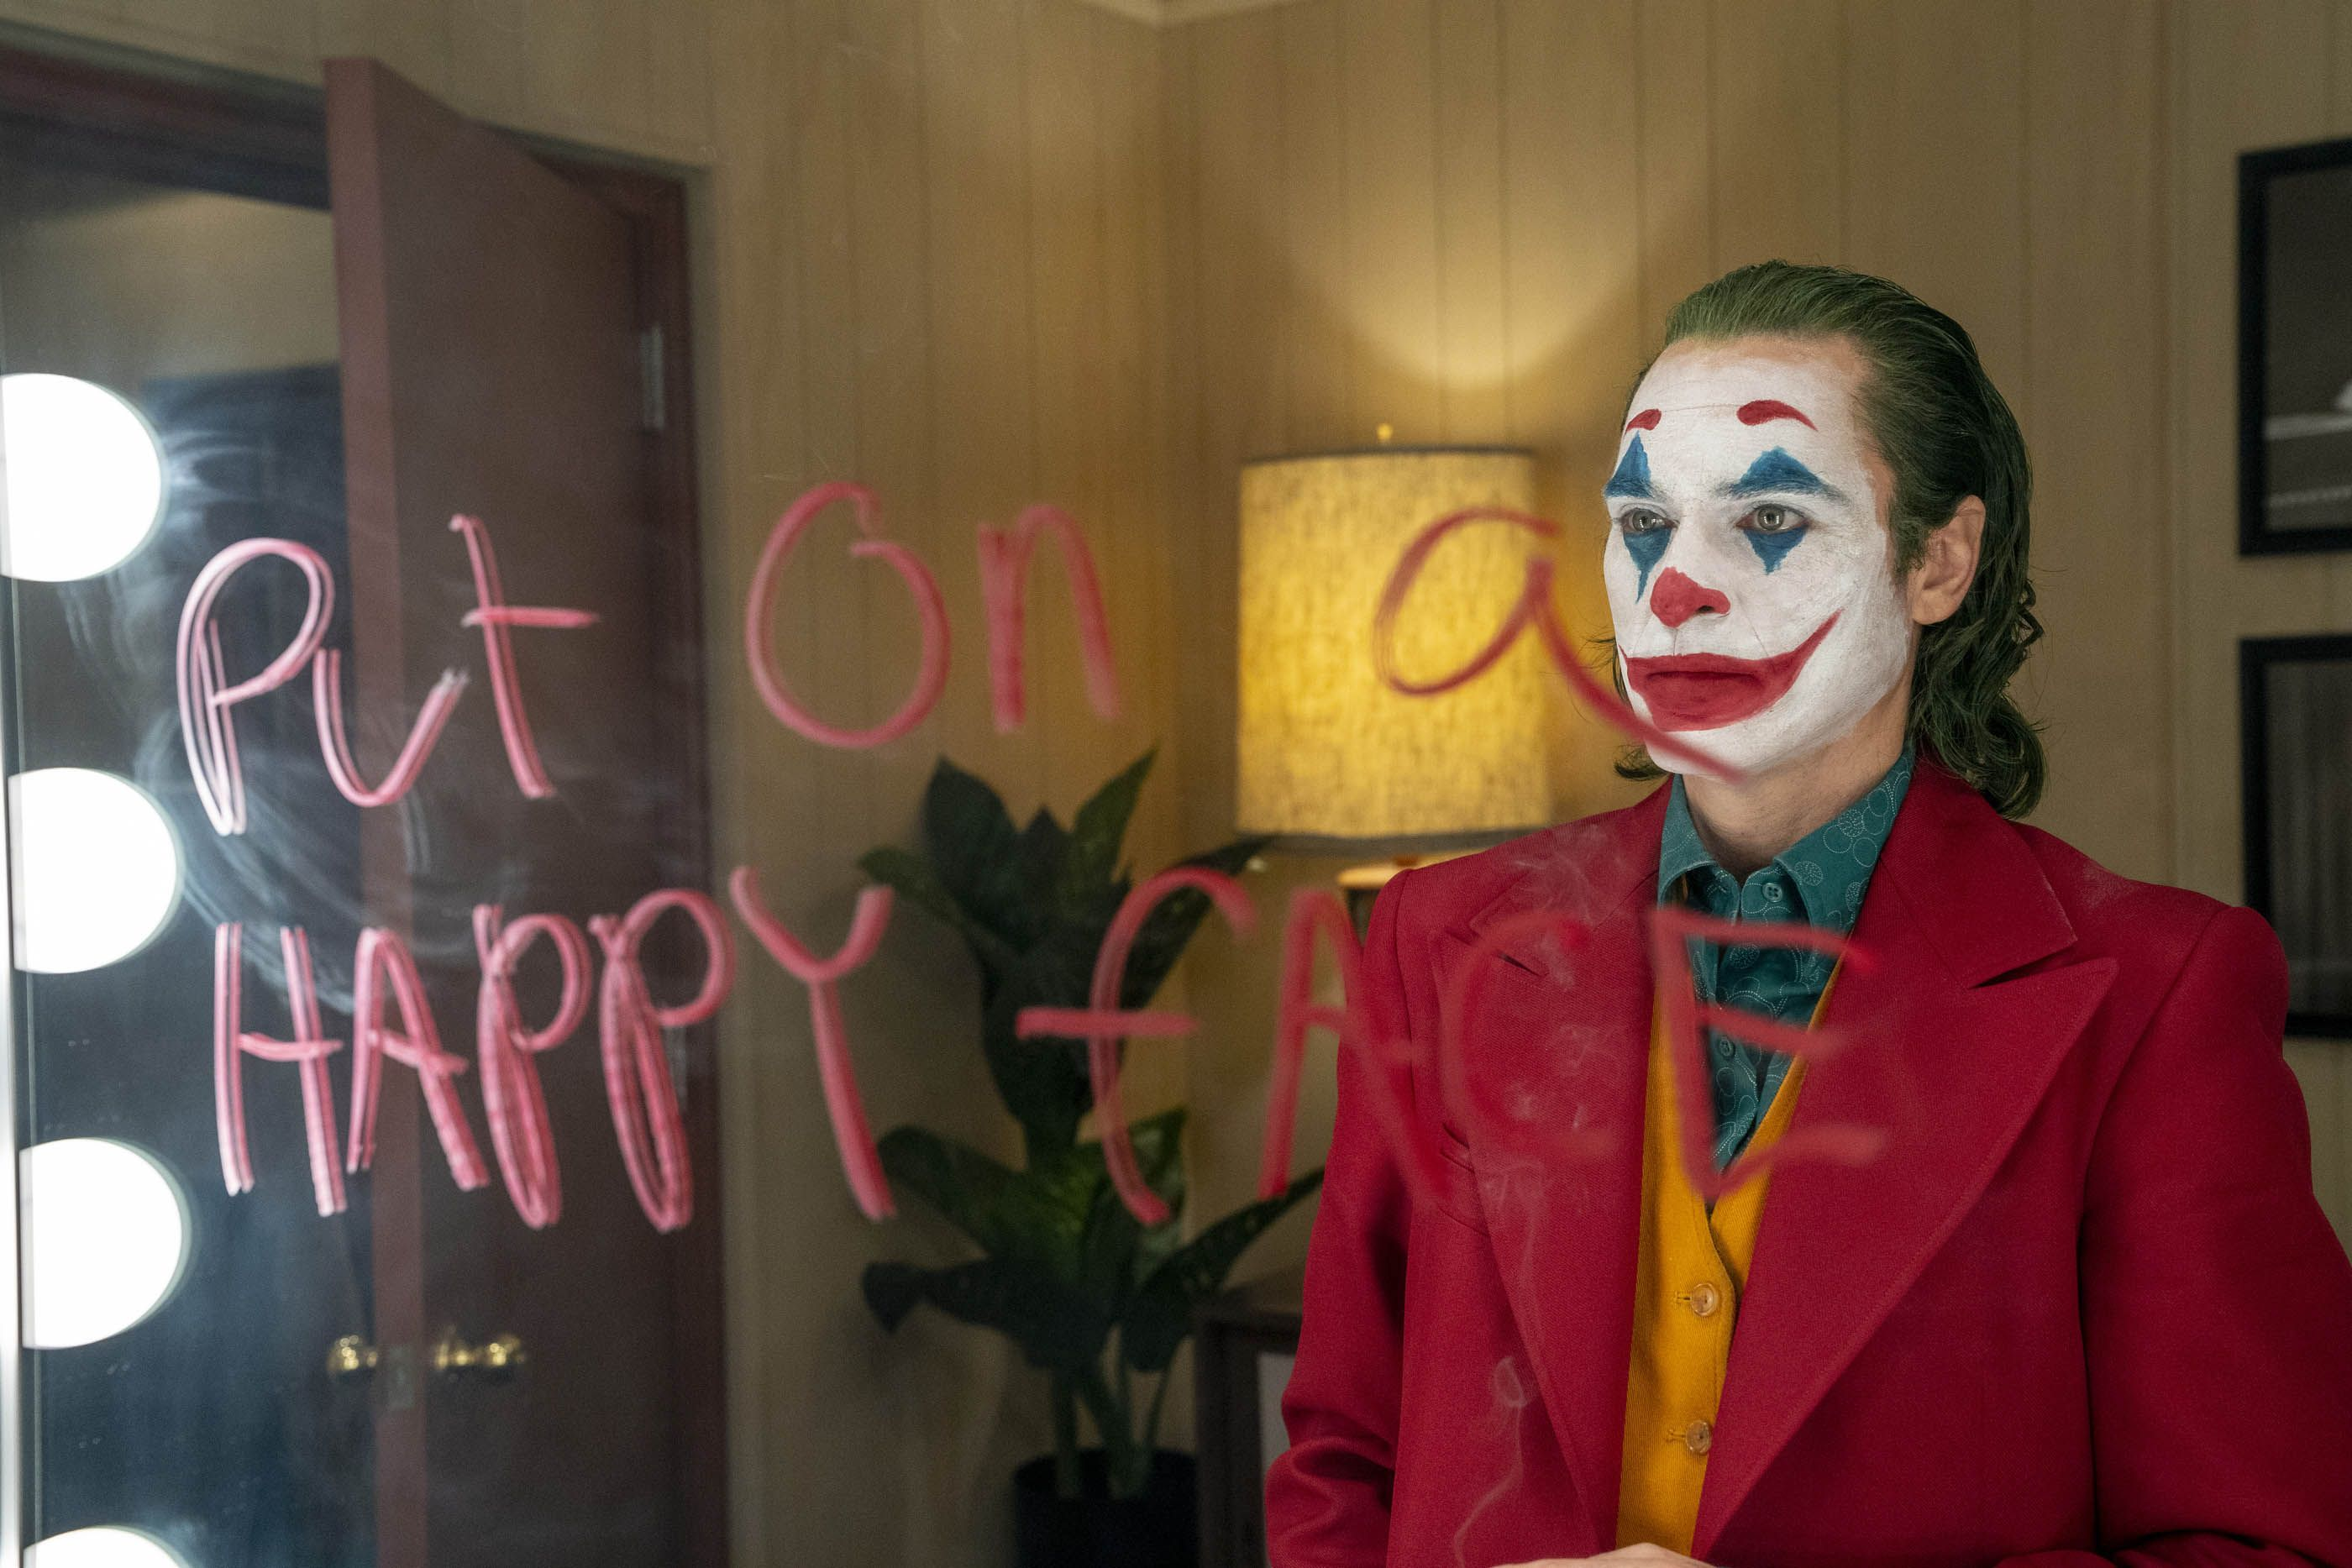 Joker Has a Profound Misunderstanding of Working People, Mental Illness, and Politics